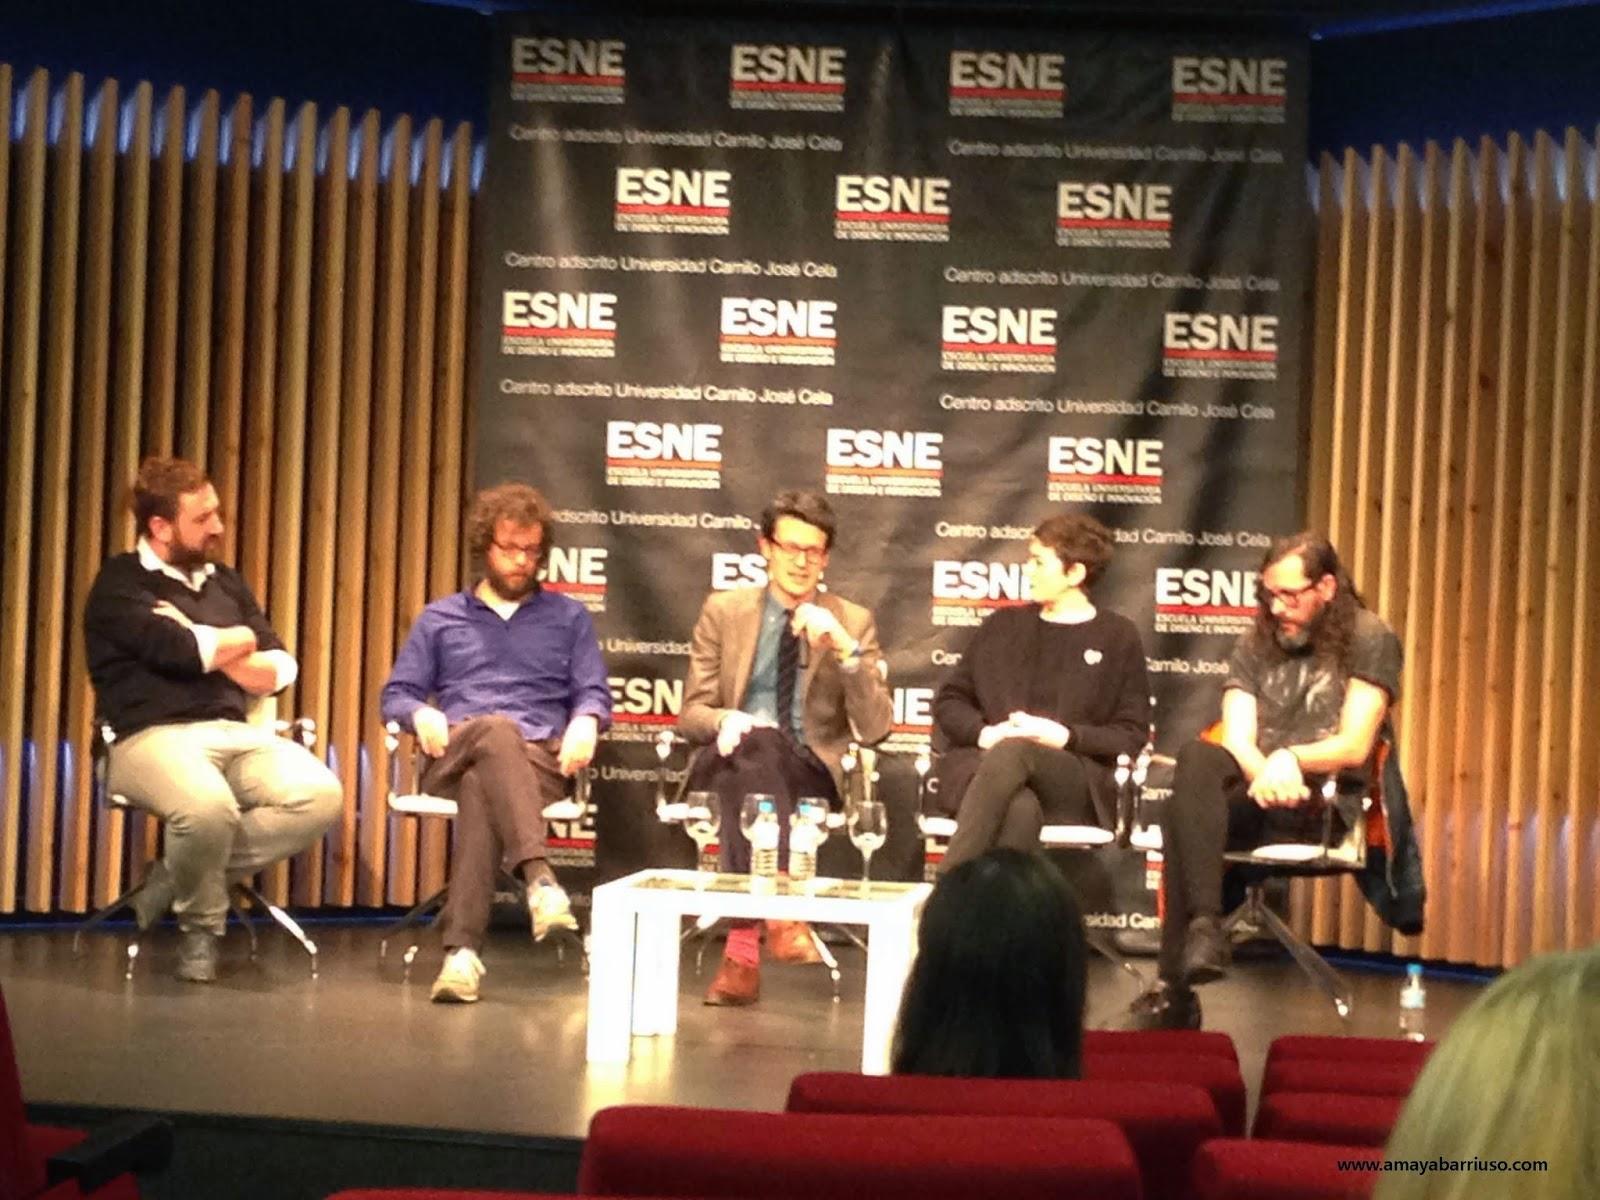 Jornadas internacionalización moda española_ESNE